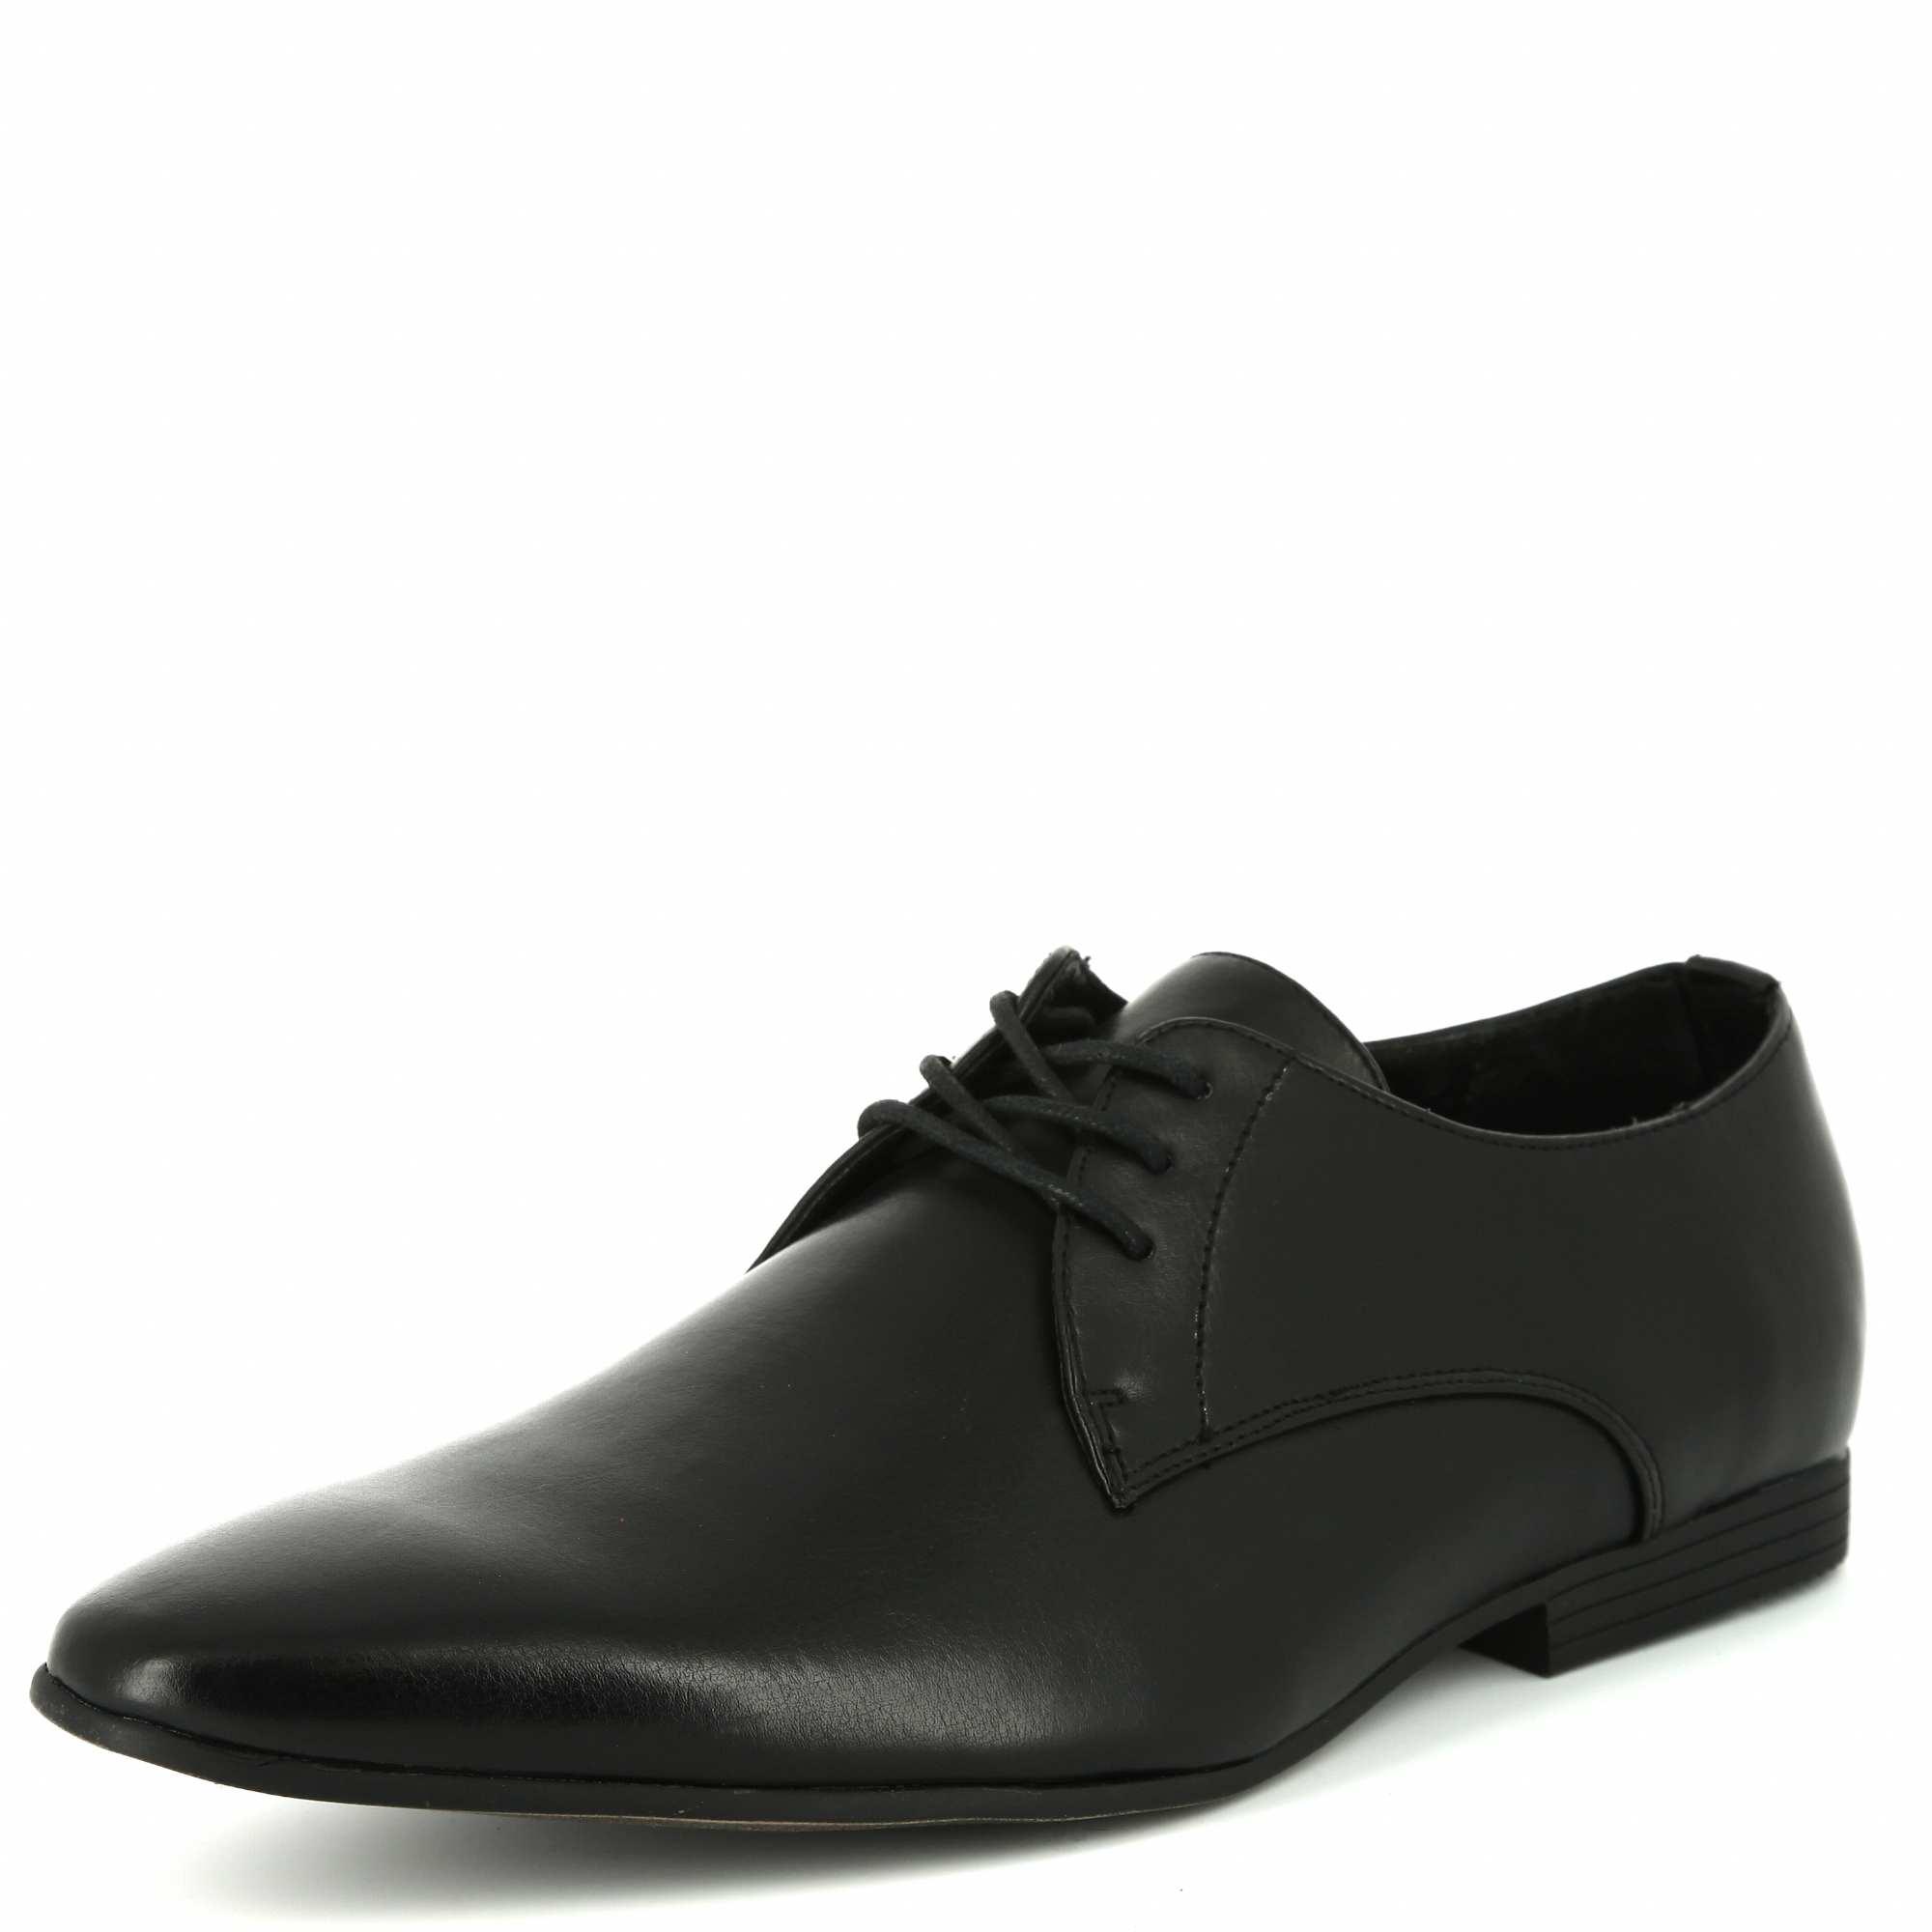 chaussures de ville homme kiabi 28 00. Black Bedroom Furniture Sets. Home Design Ideas